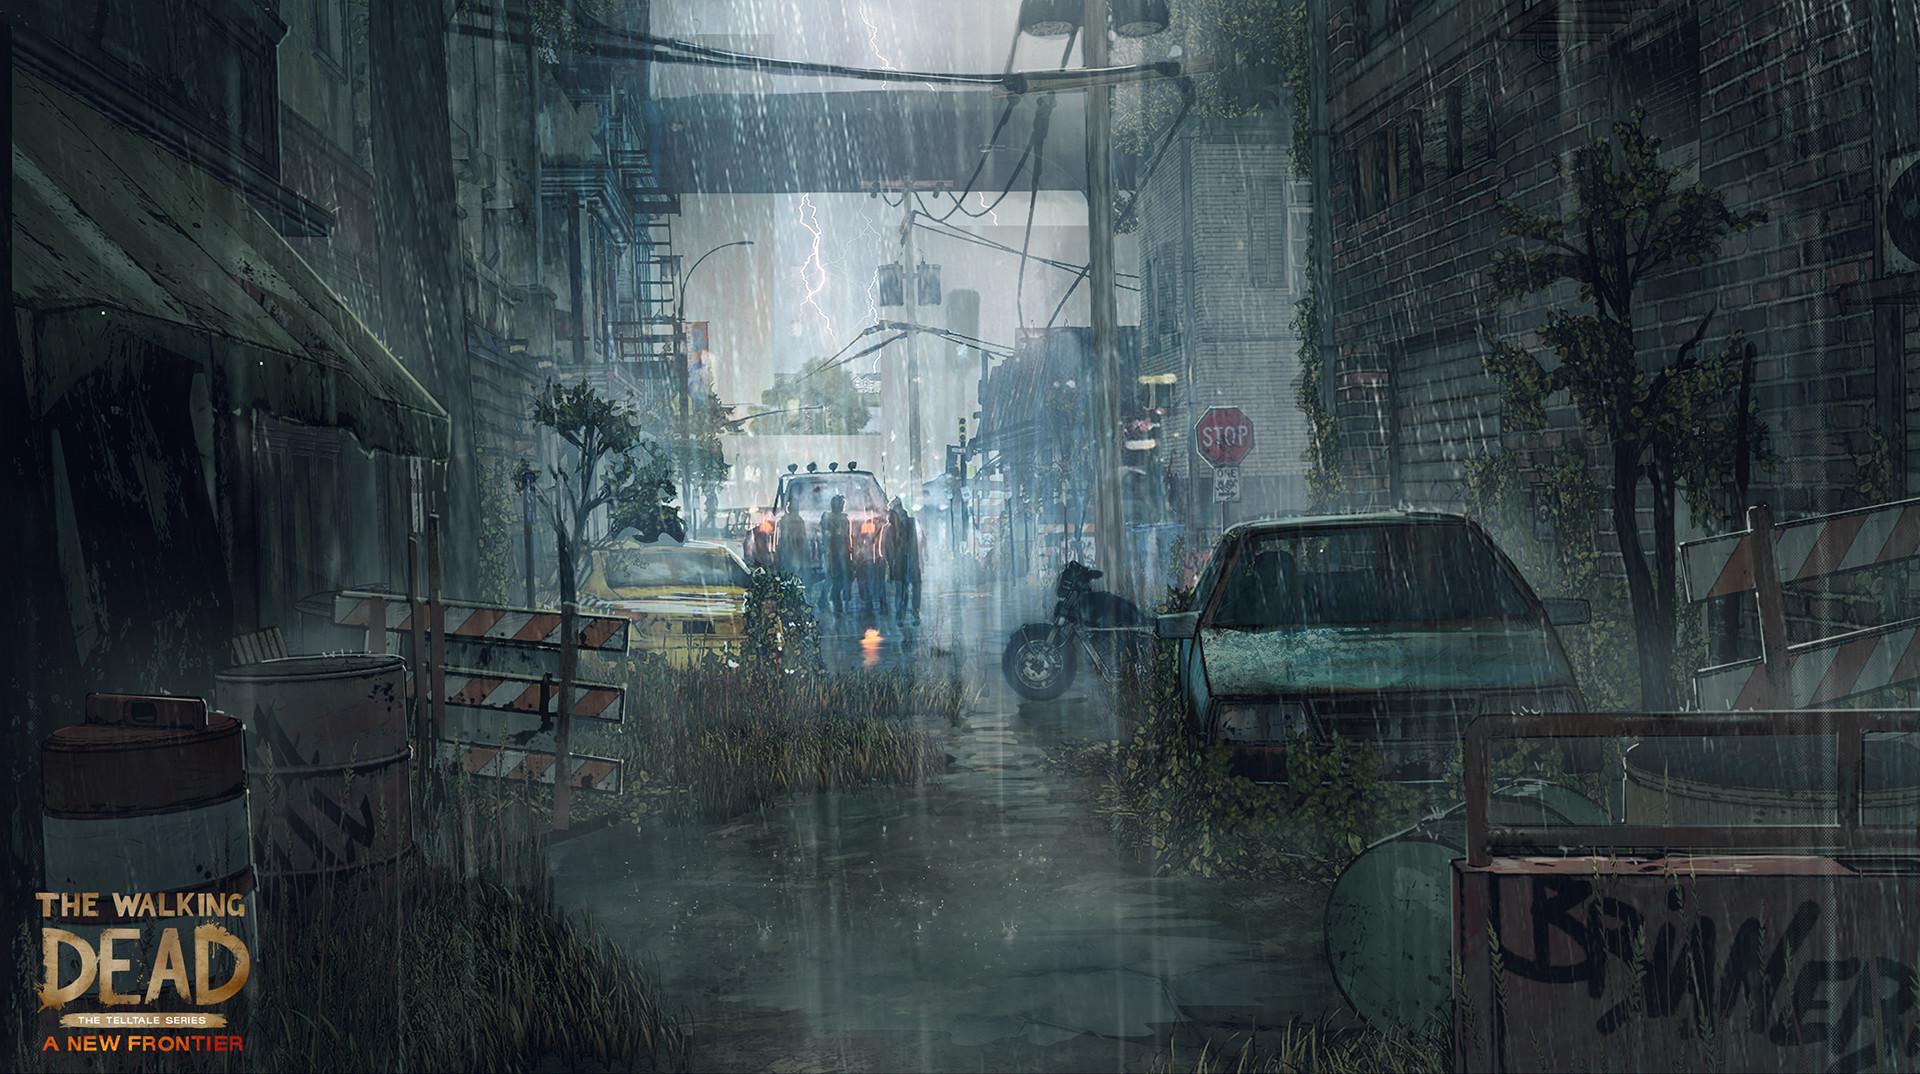 joyce-xu-env-streetlighting.jpg